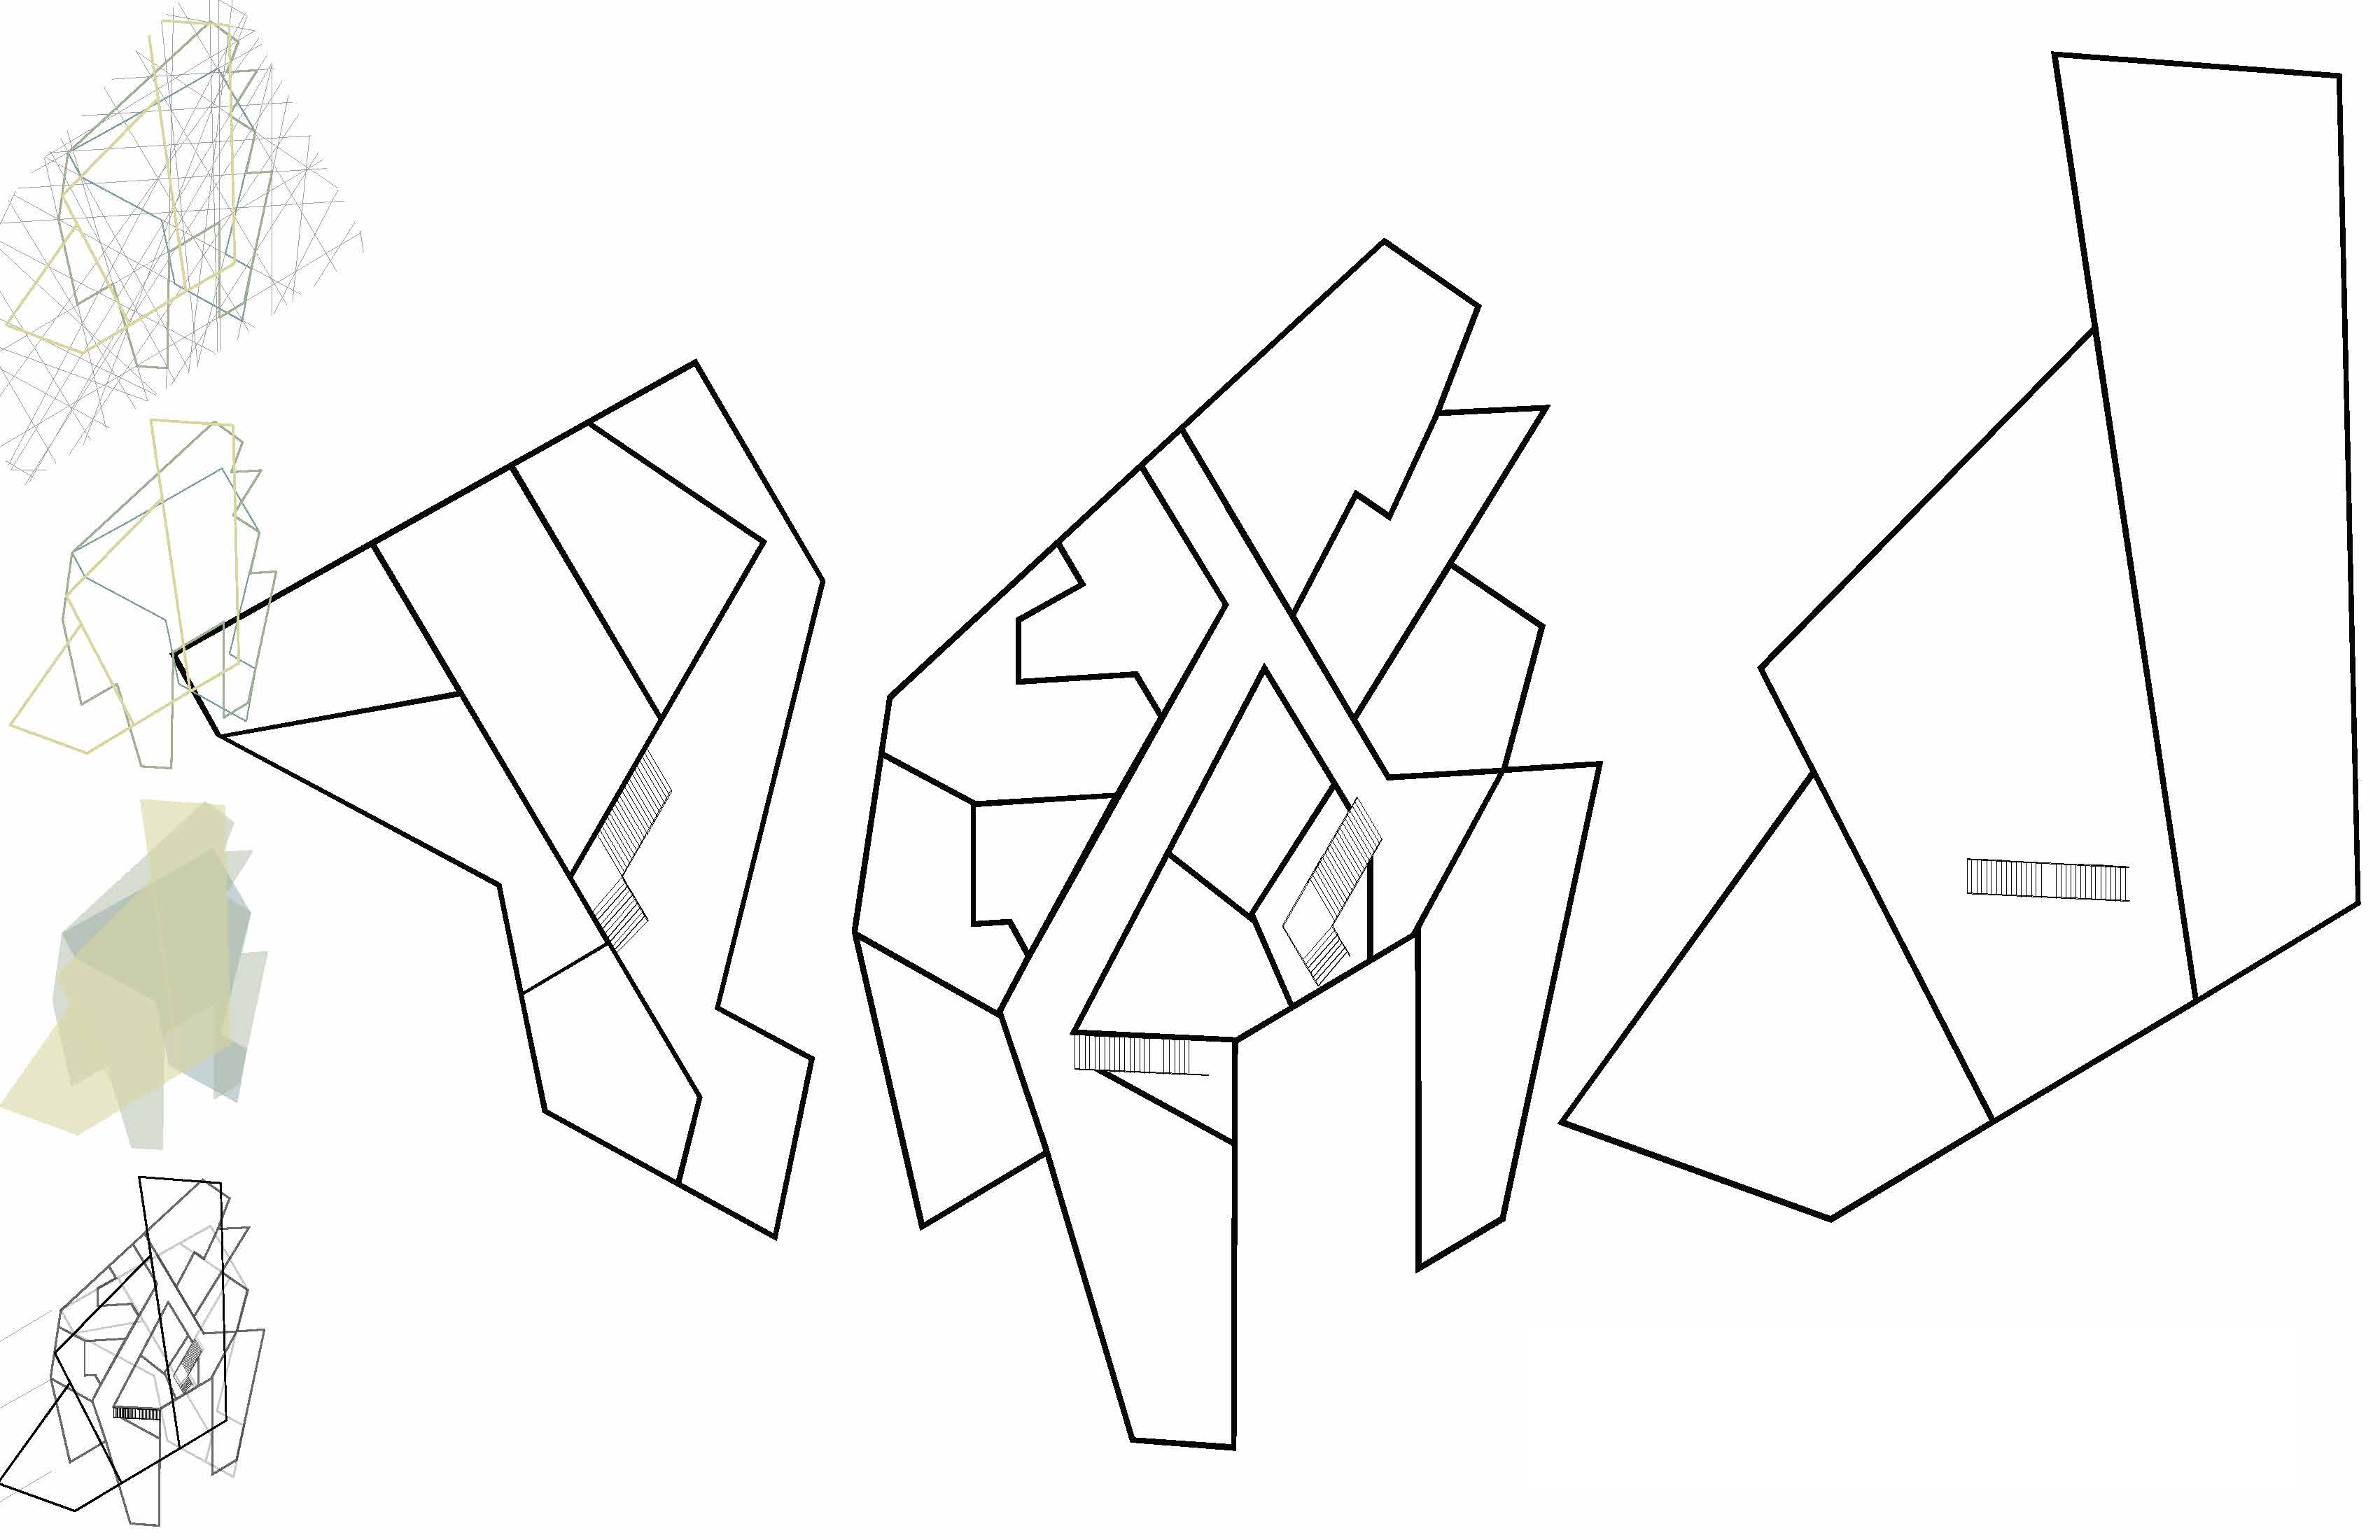 initial form studies